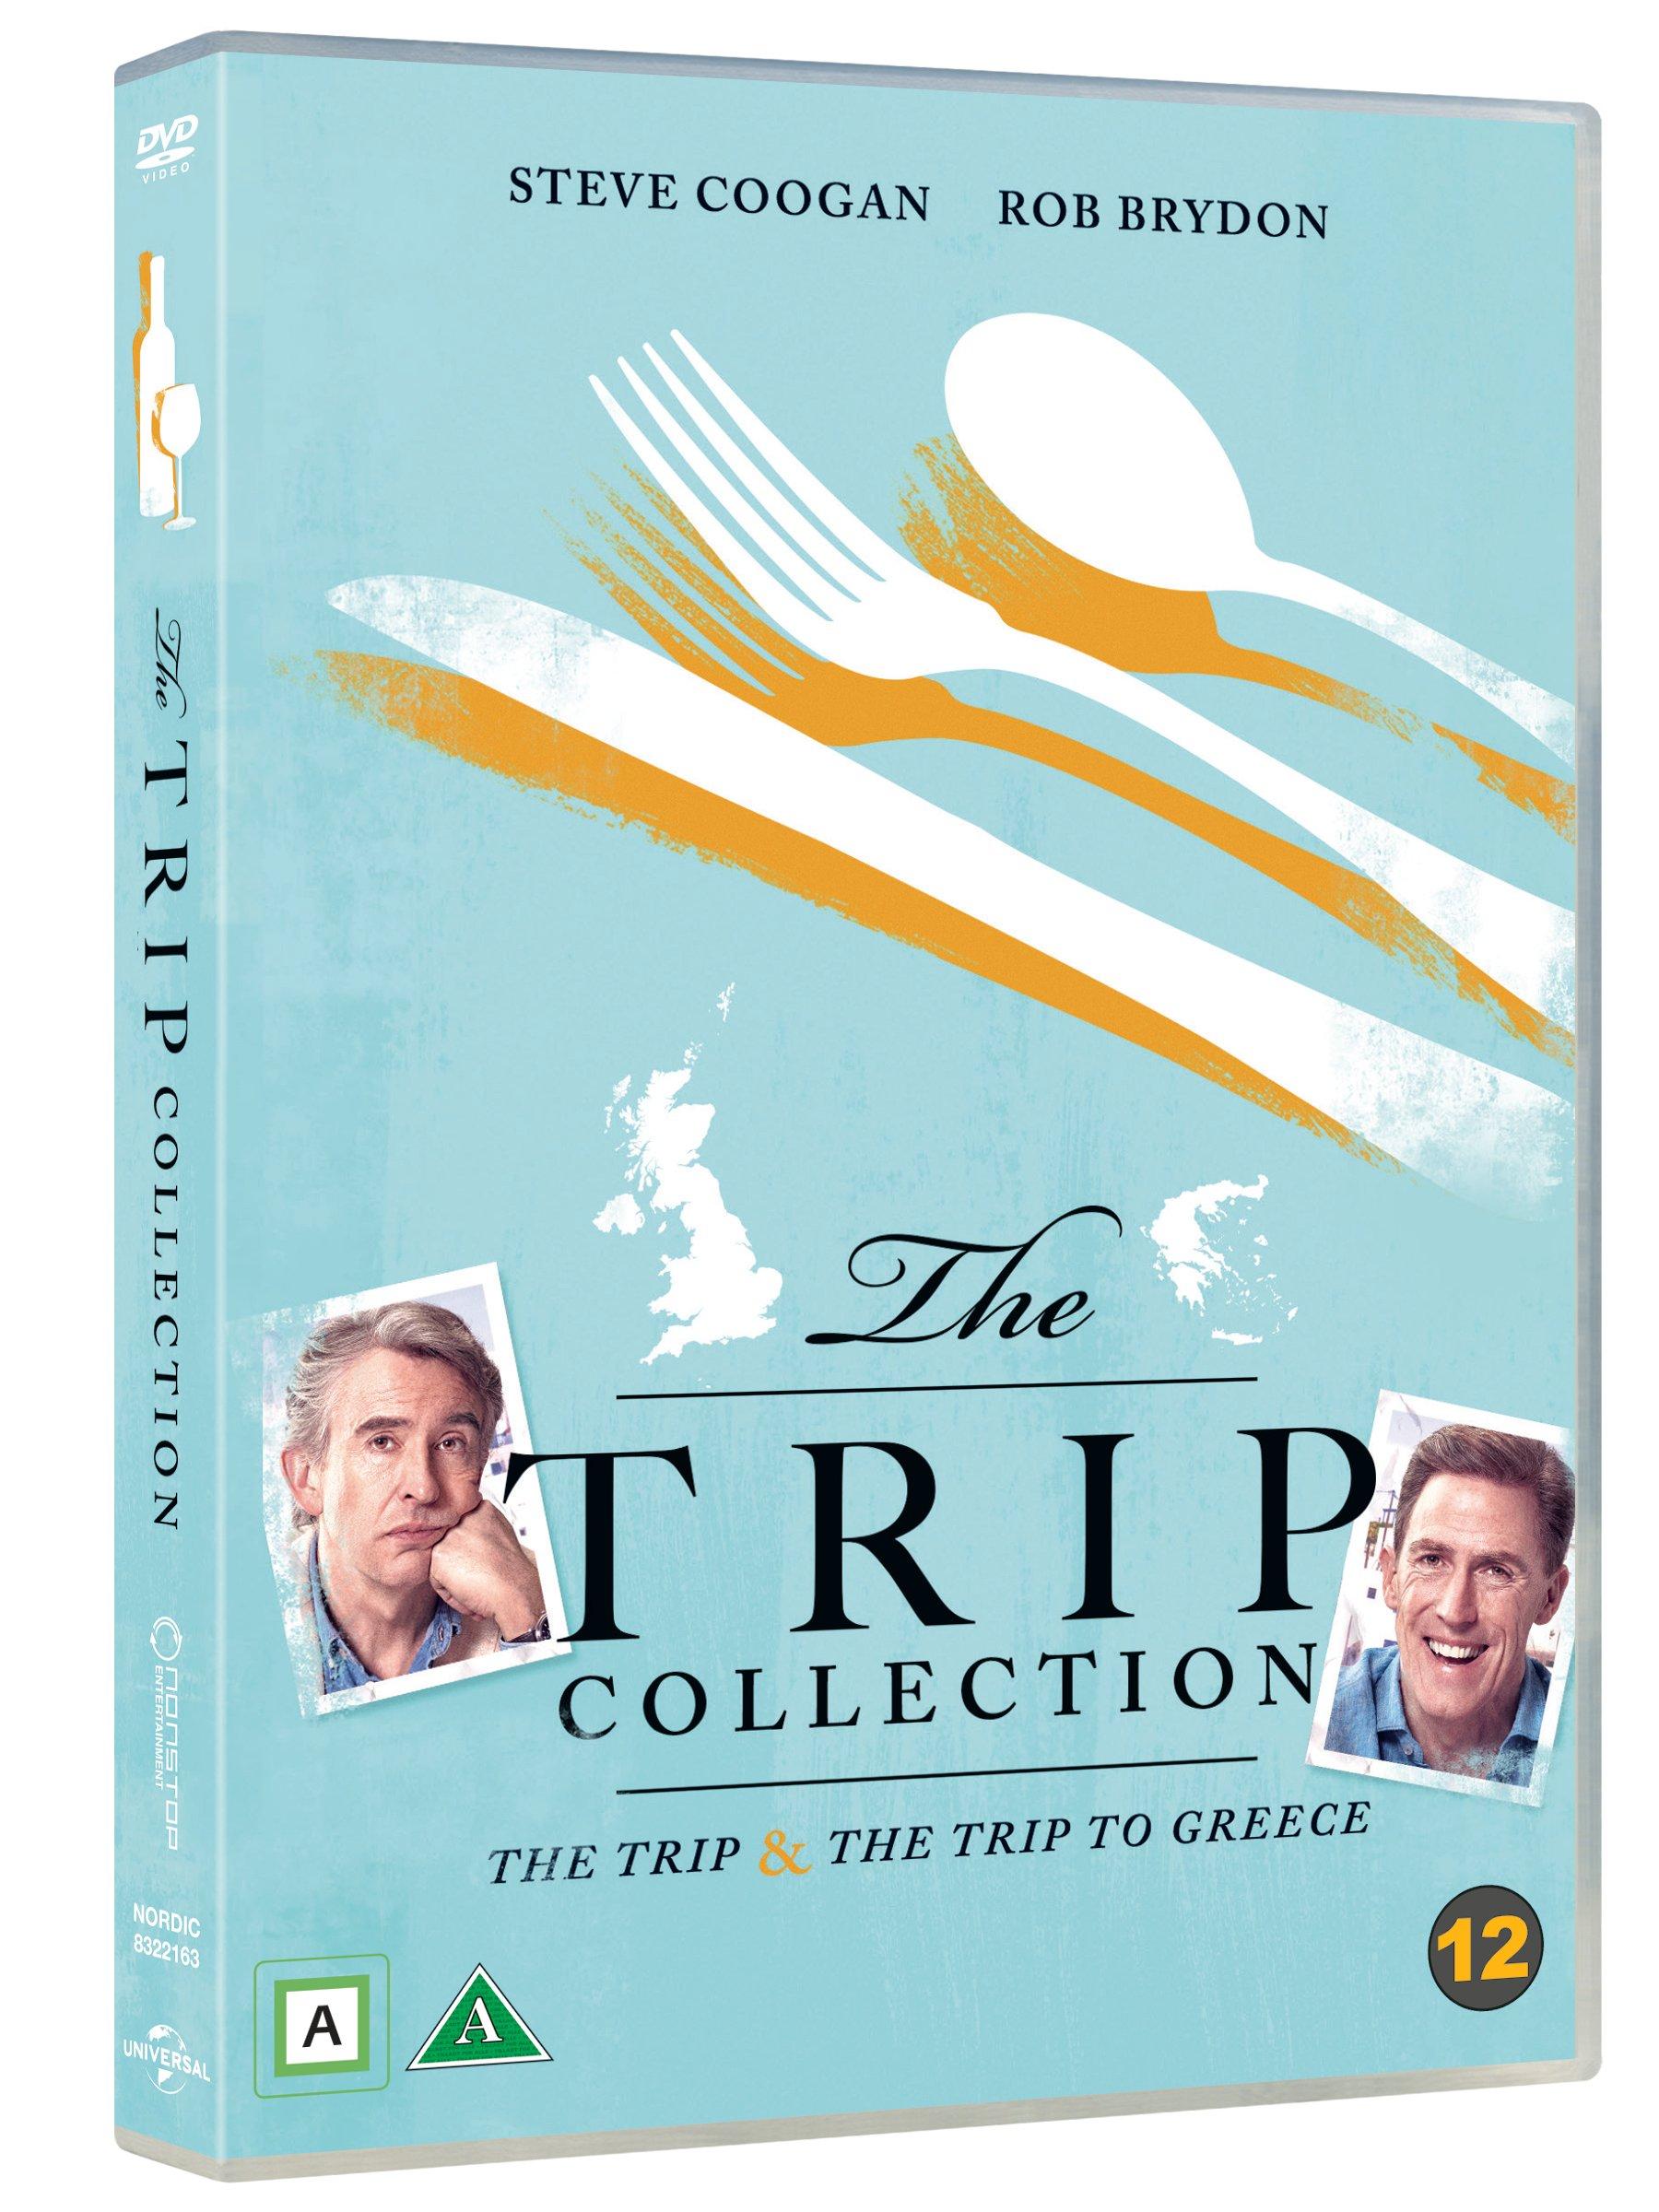 The Trip To Greece & The Trip Box - DVD